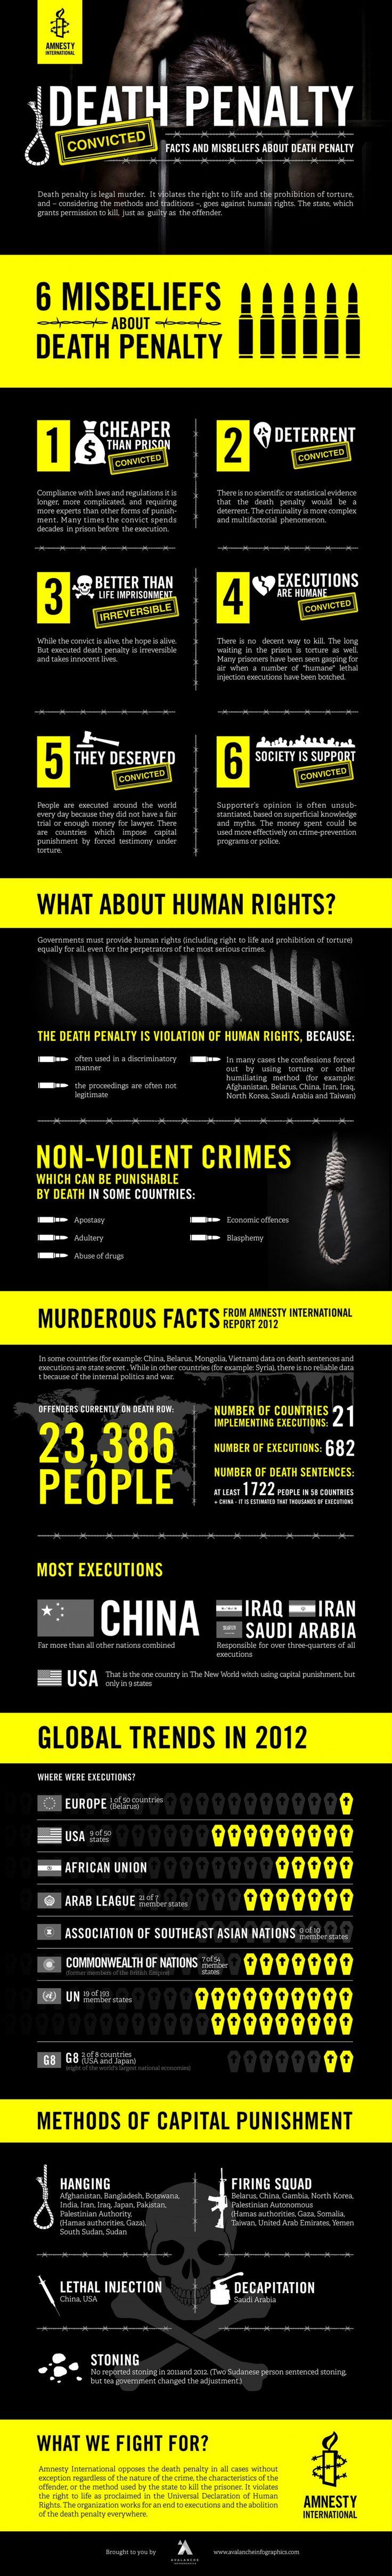 Best 25+ Amnesty international ideas on Pinterest | Cv ...